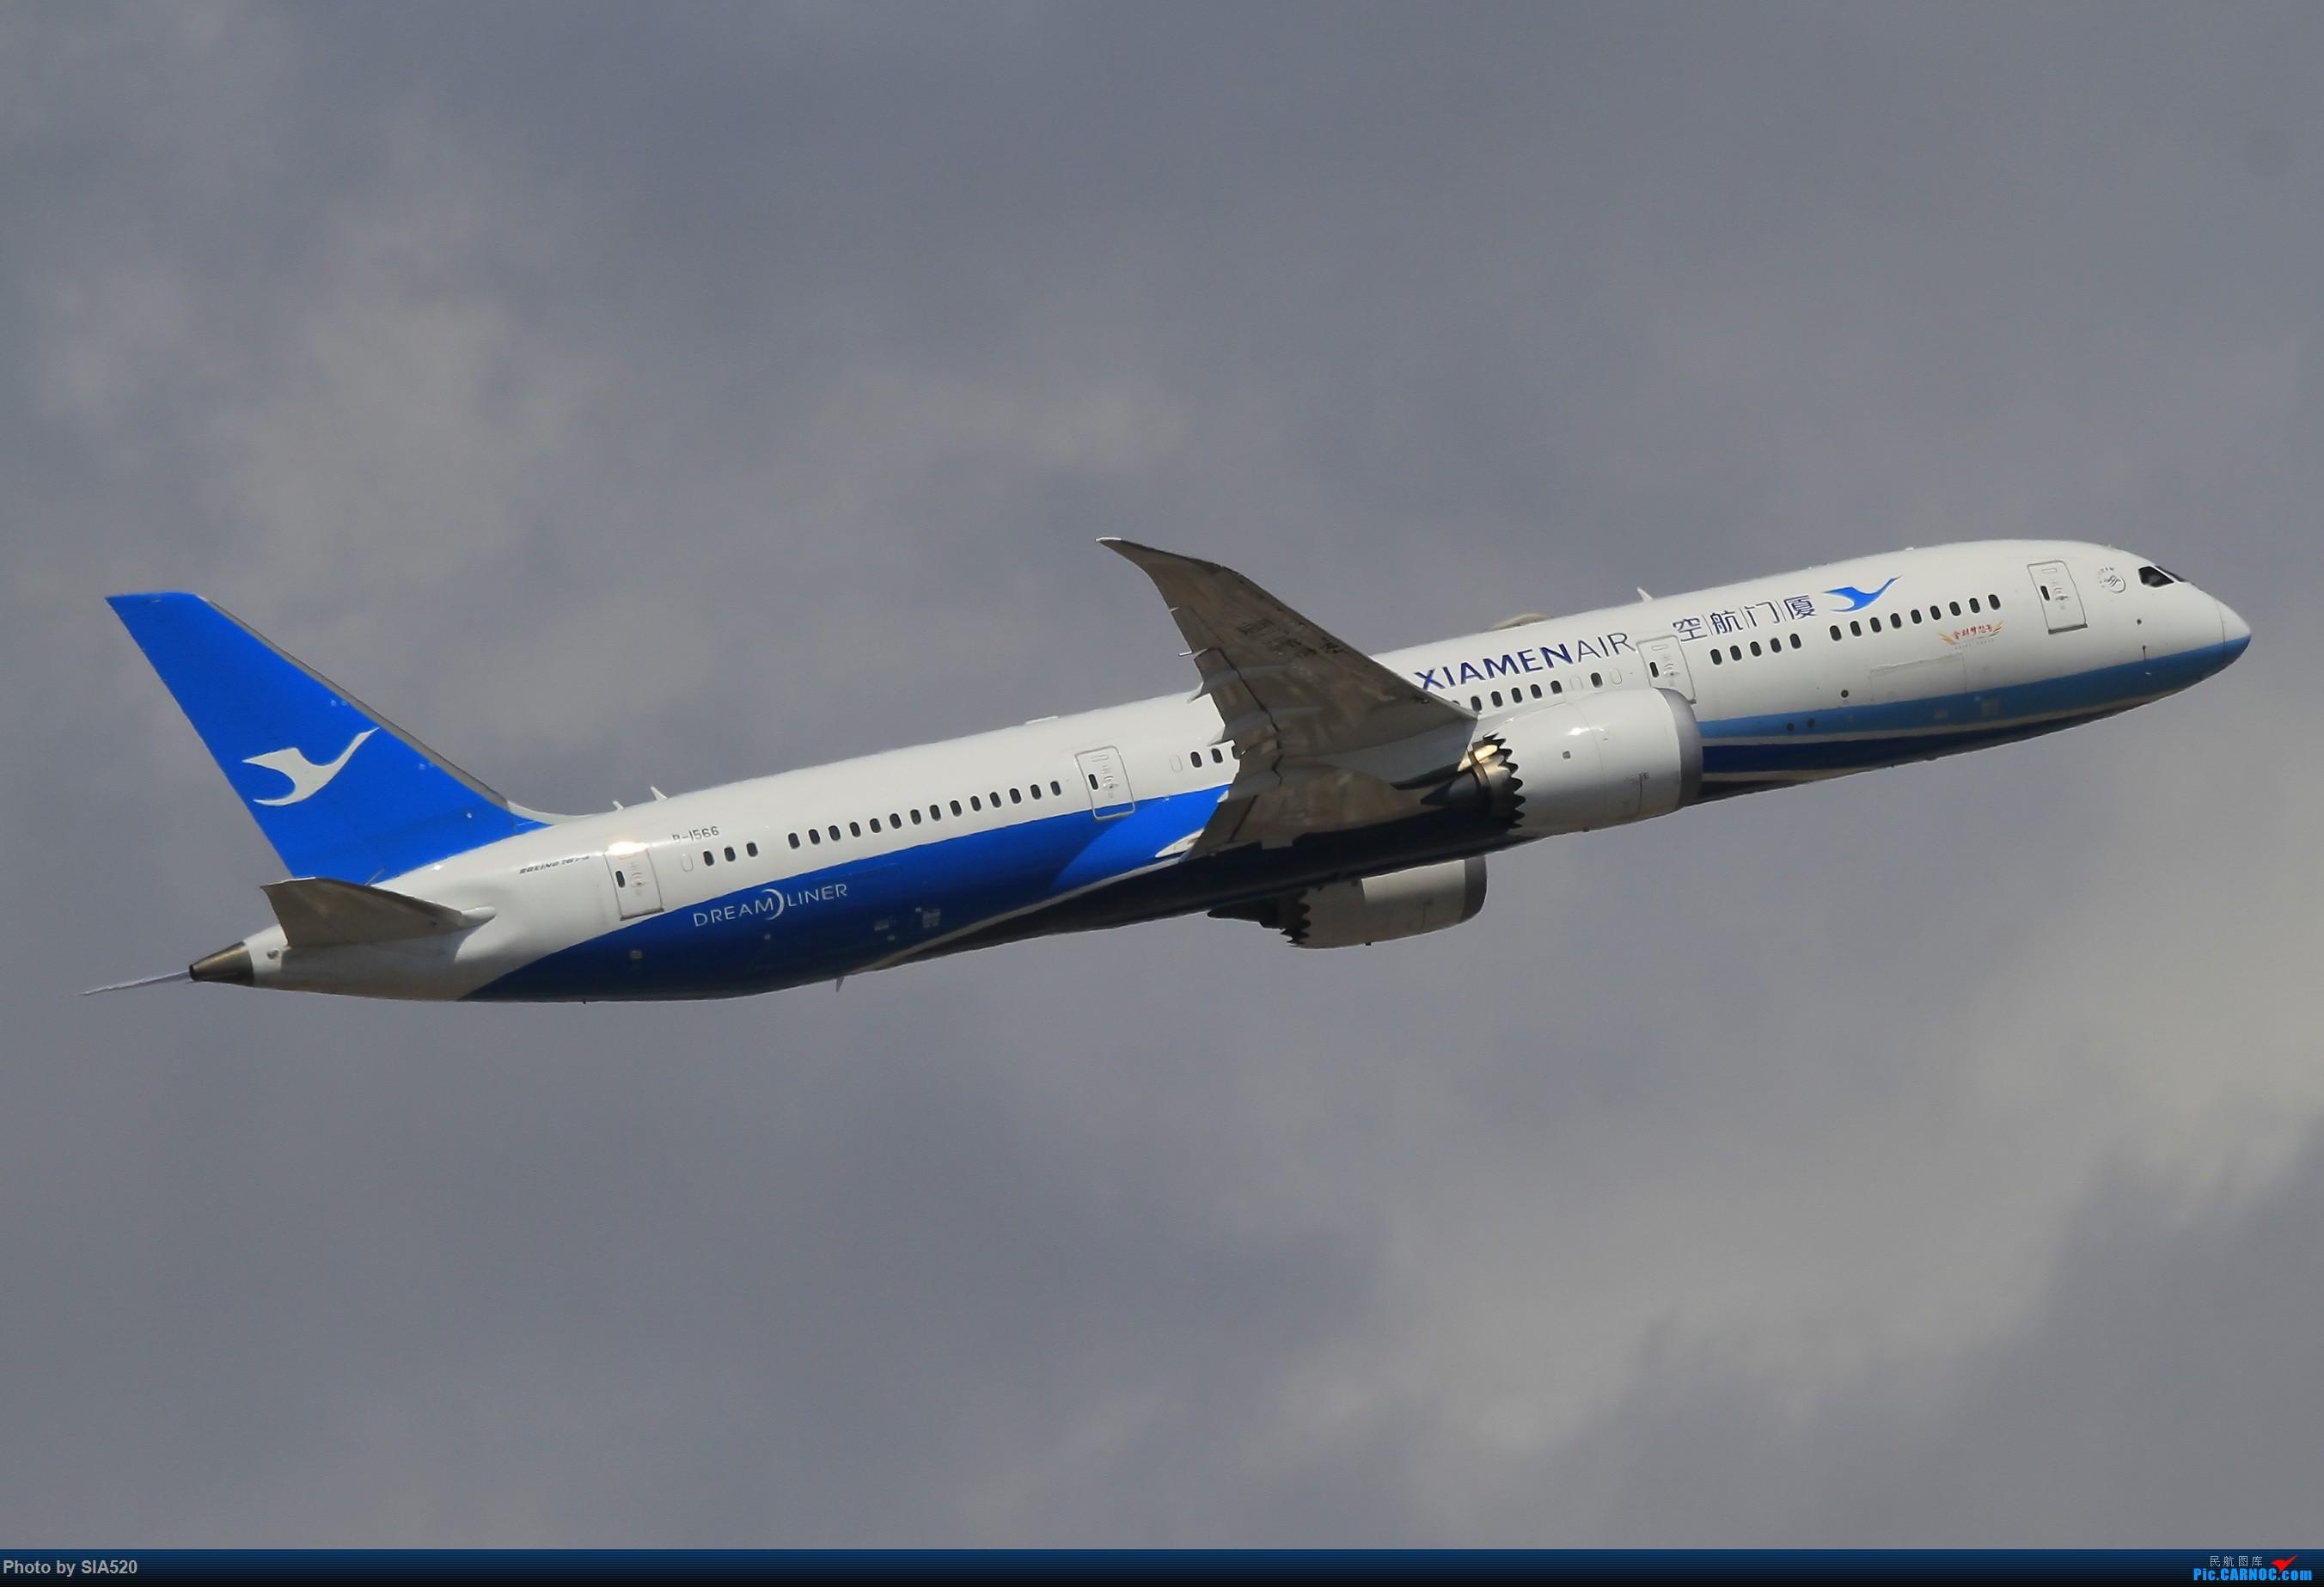 Re:[原创]北京人儿在三亚—600mm解锁凤凰 BOEING 787-9 B-1566 中国三亚凤凰国际机场